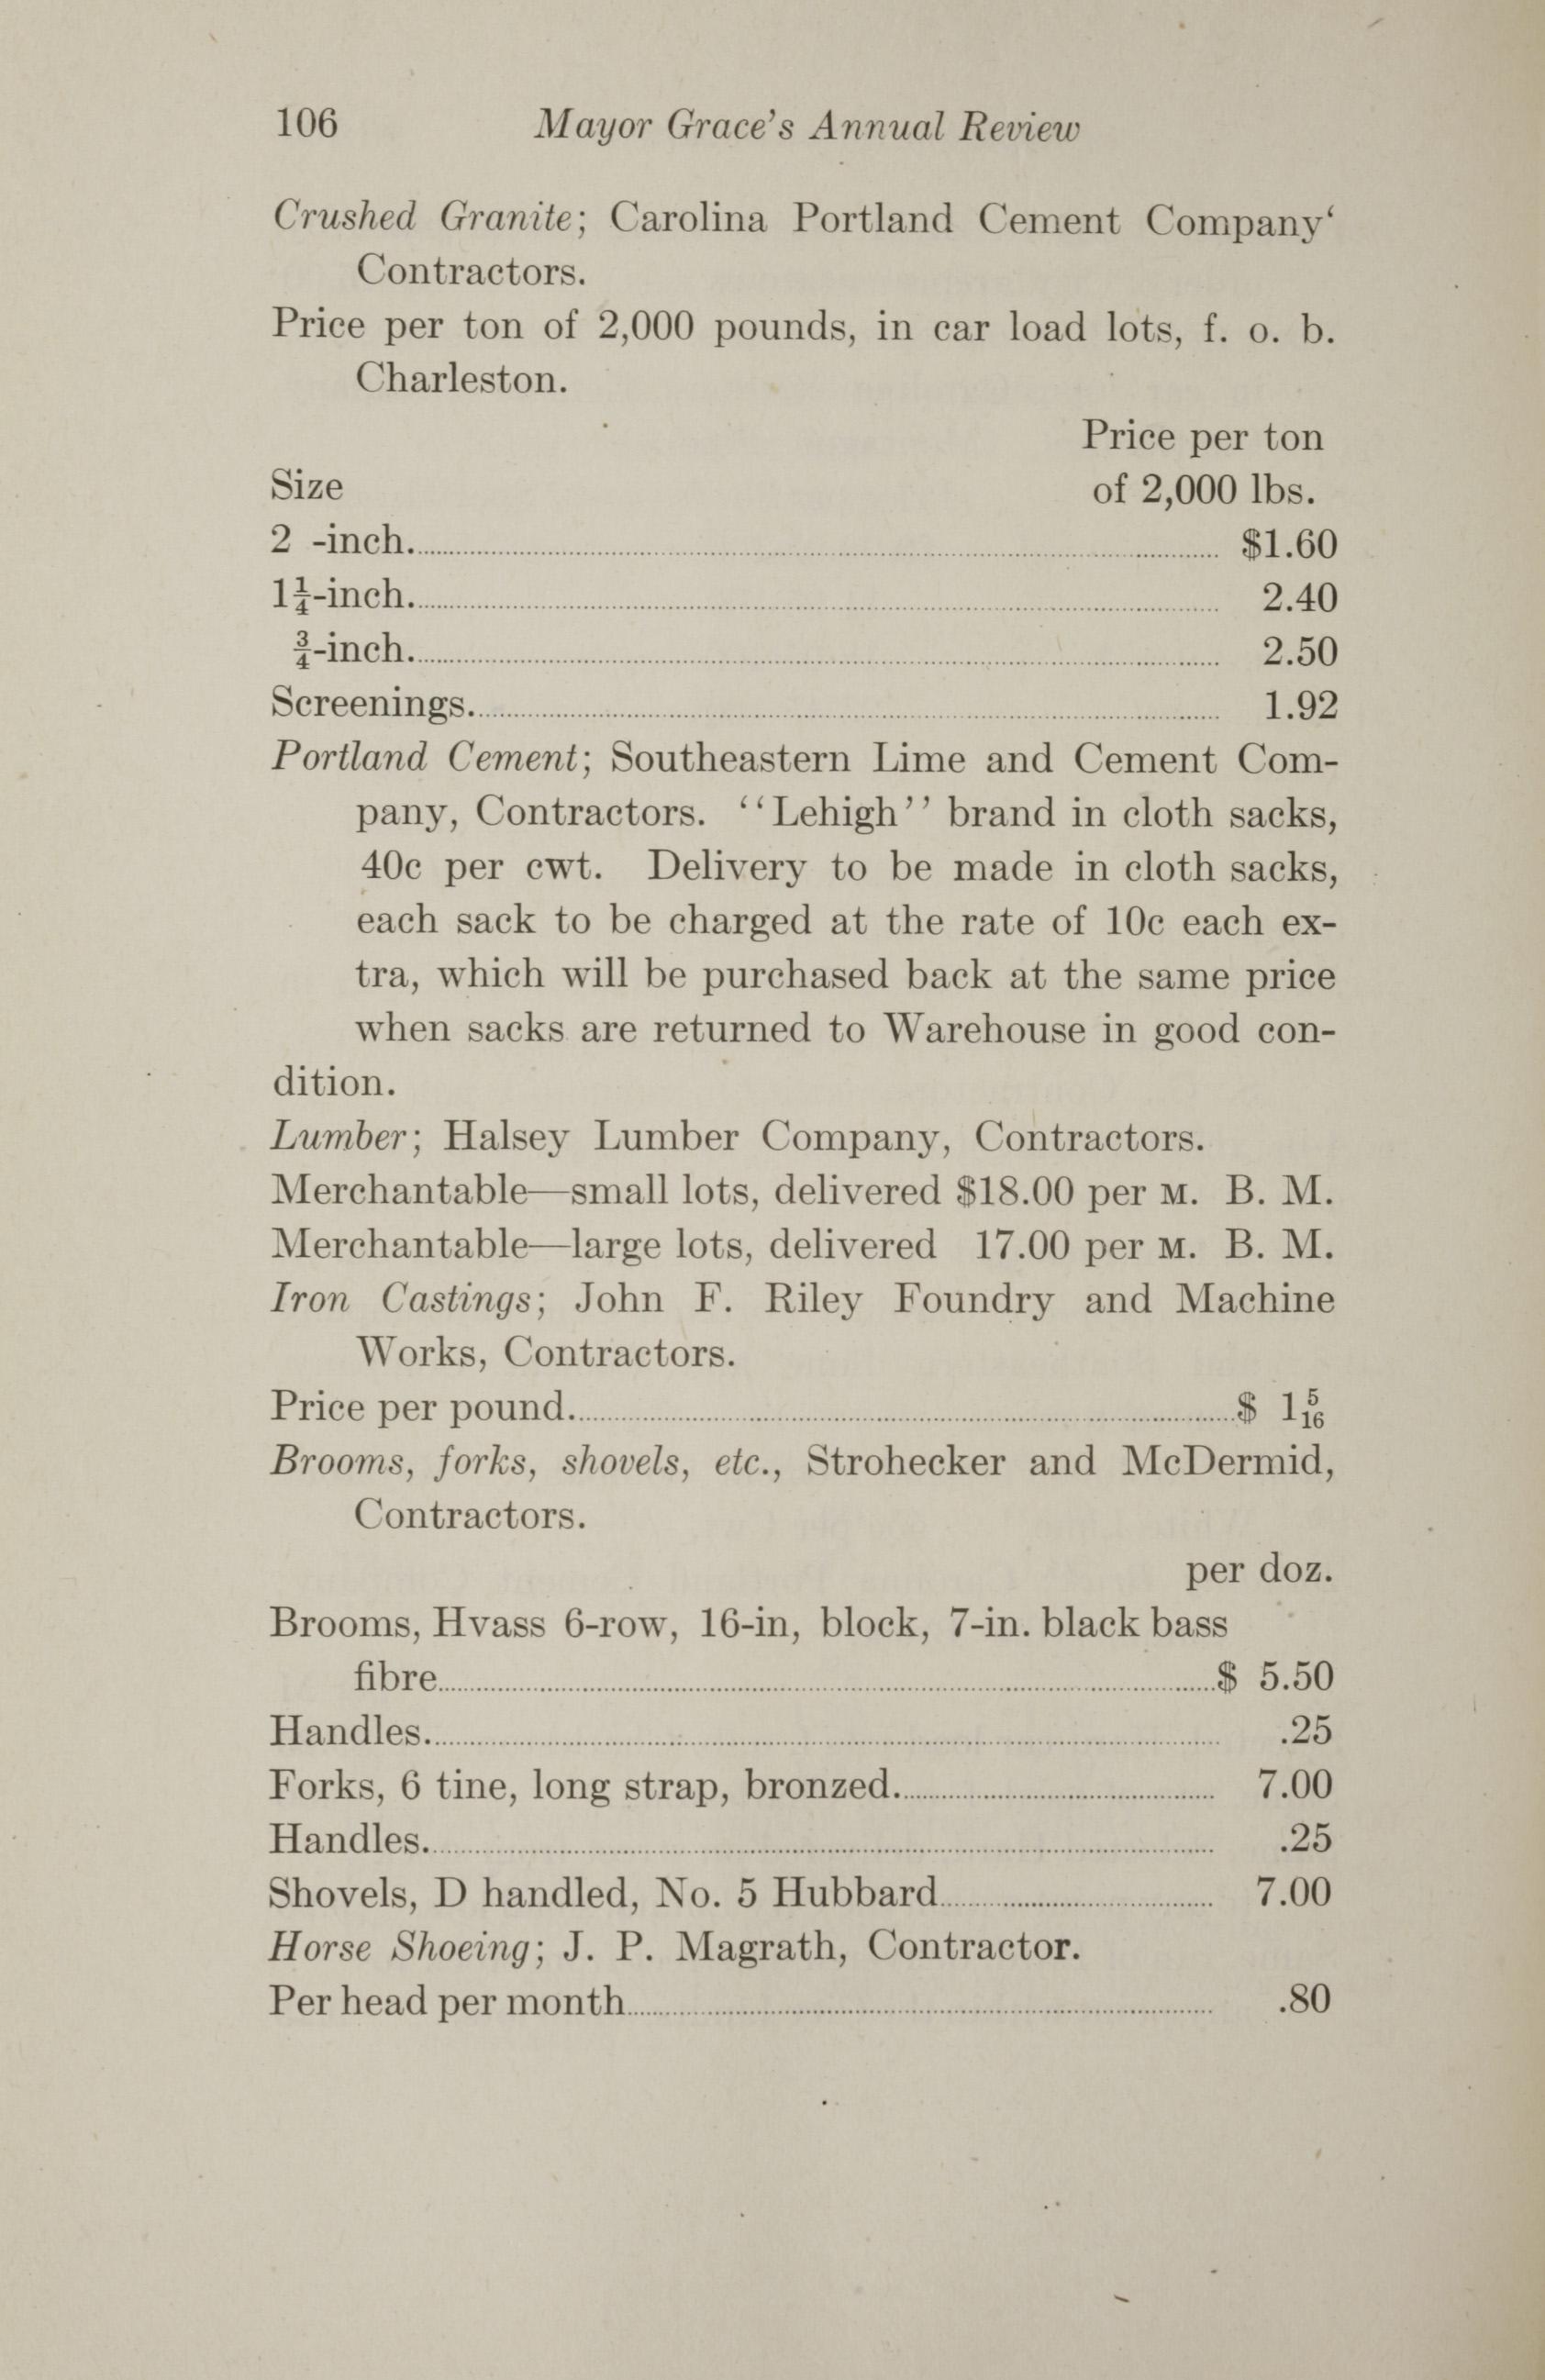 Charleston Yearbook, 1912, page 106